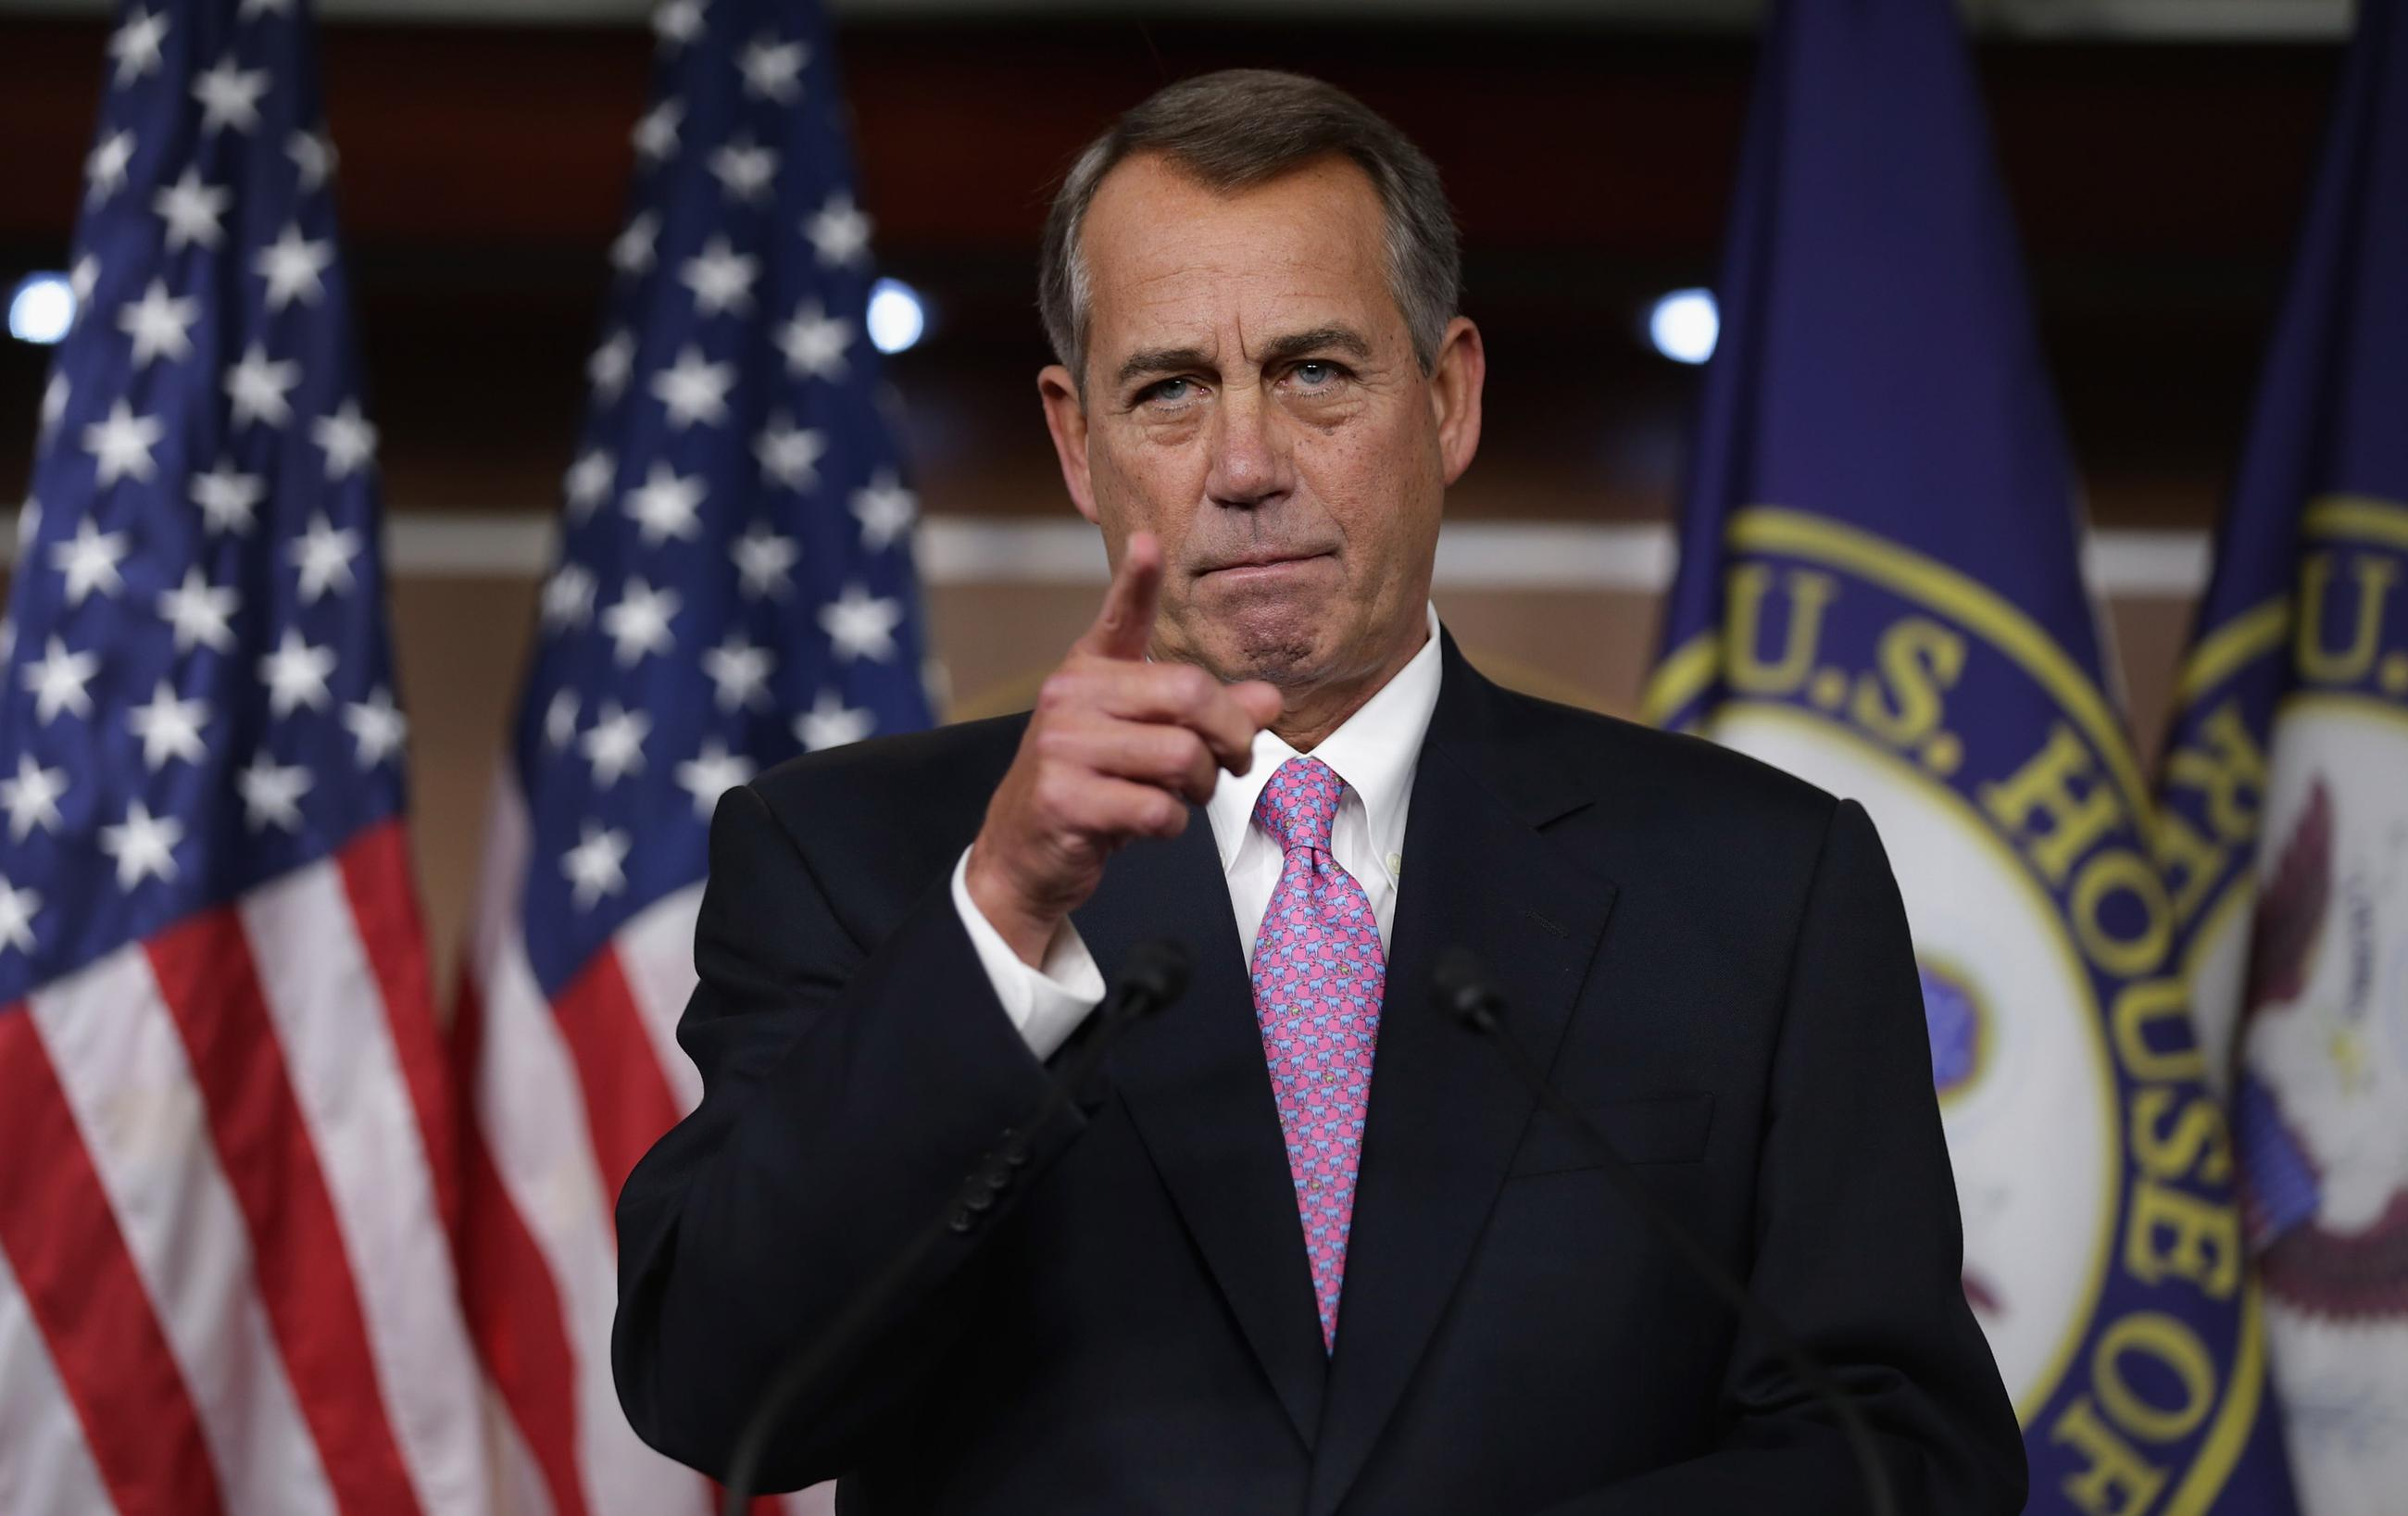 John Boehner Had the Best Year in Washington